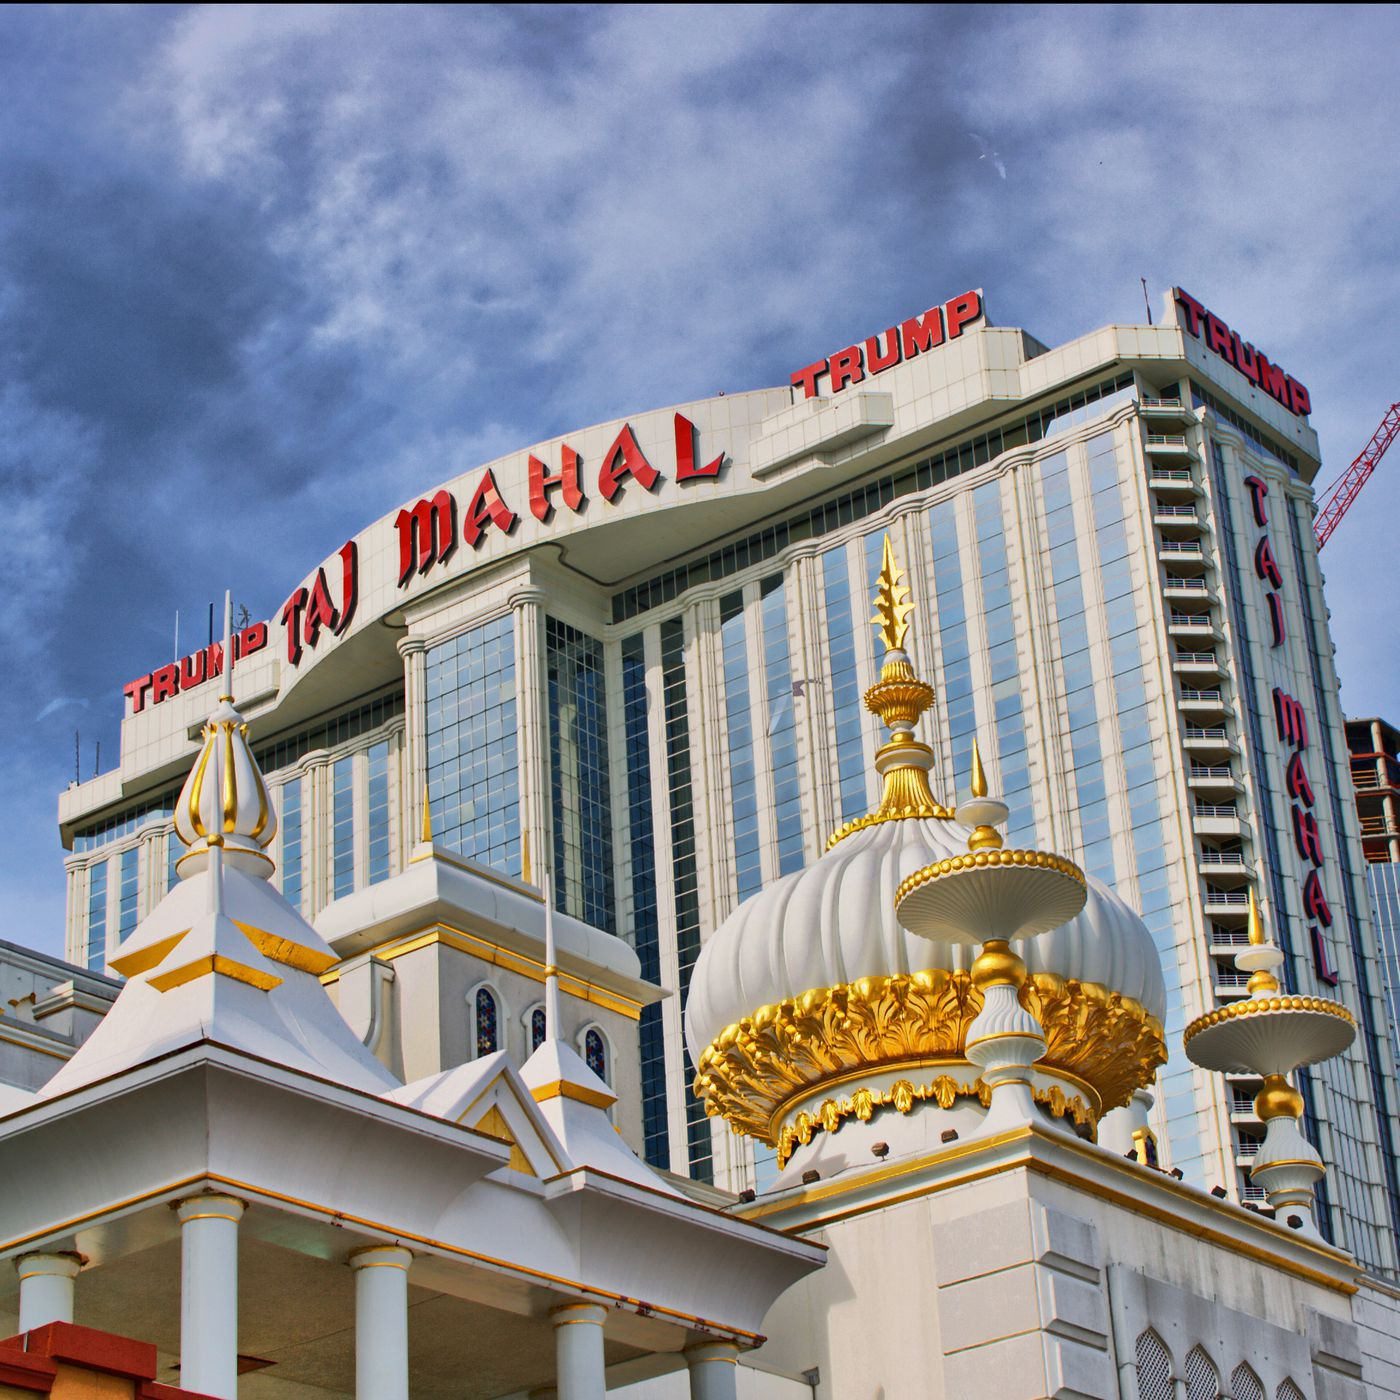 Atlantic city casino shows august 2013 online casino payment methods